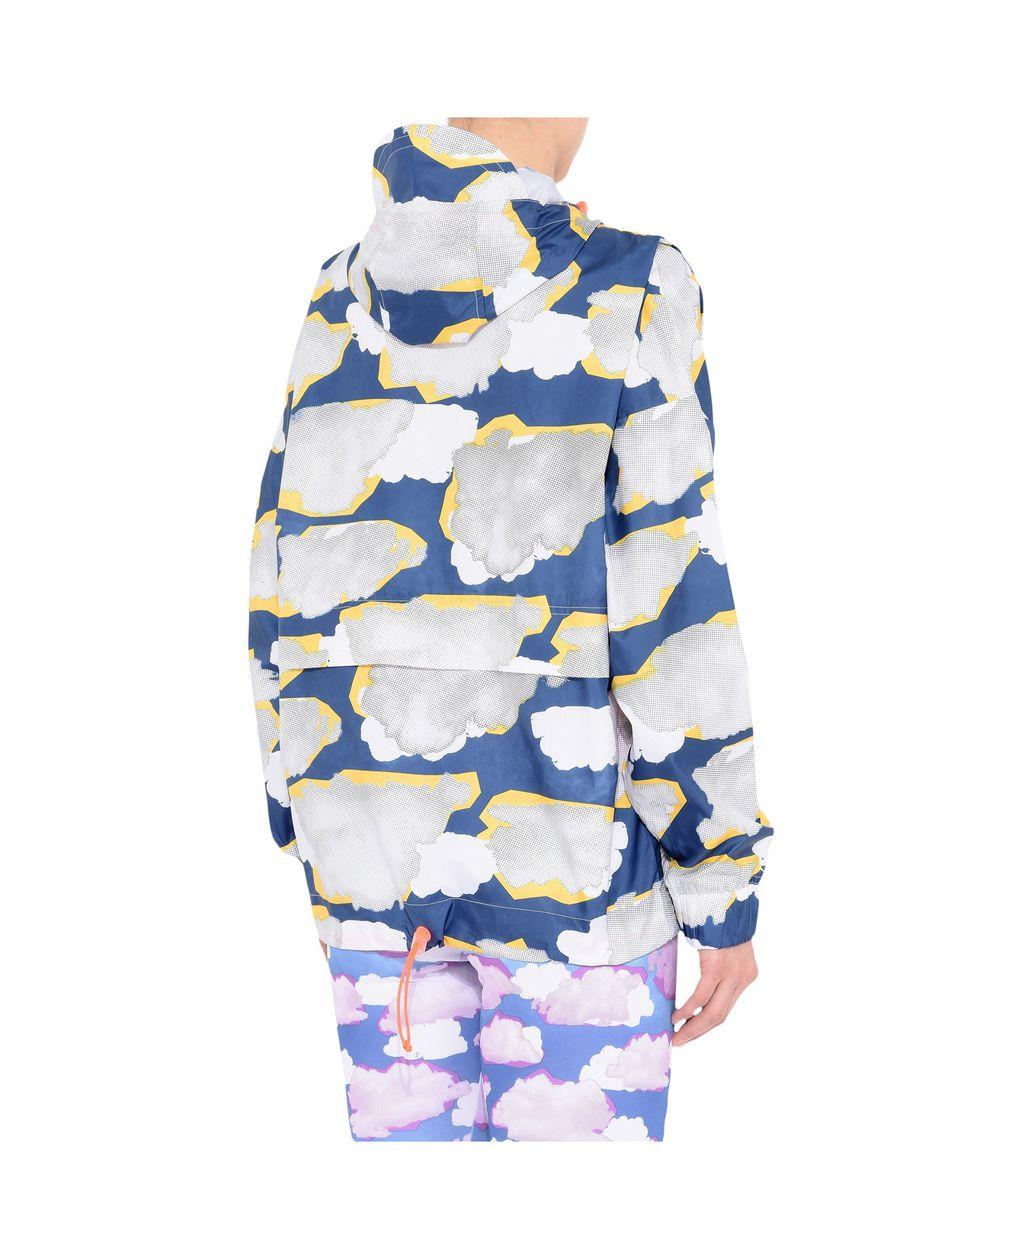 Cloud Print Jacket - ADIDAS by STELLA McCARTNEY